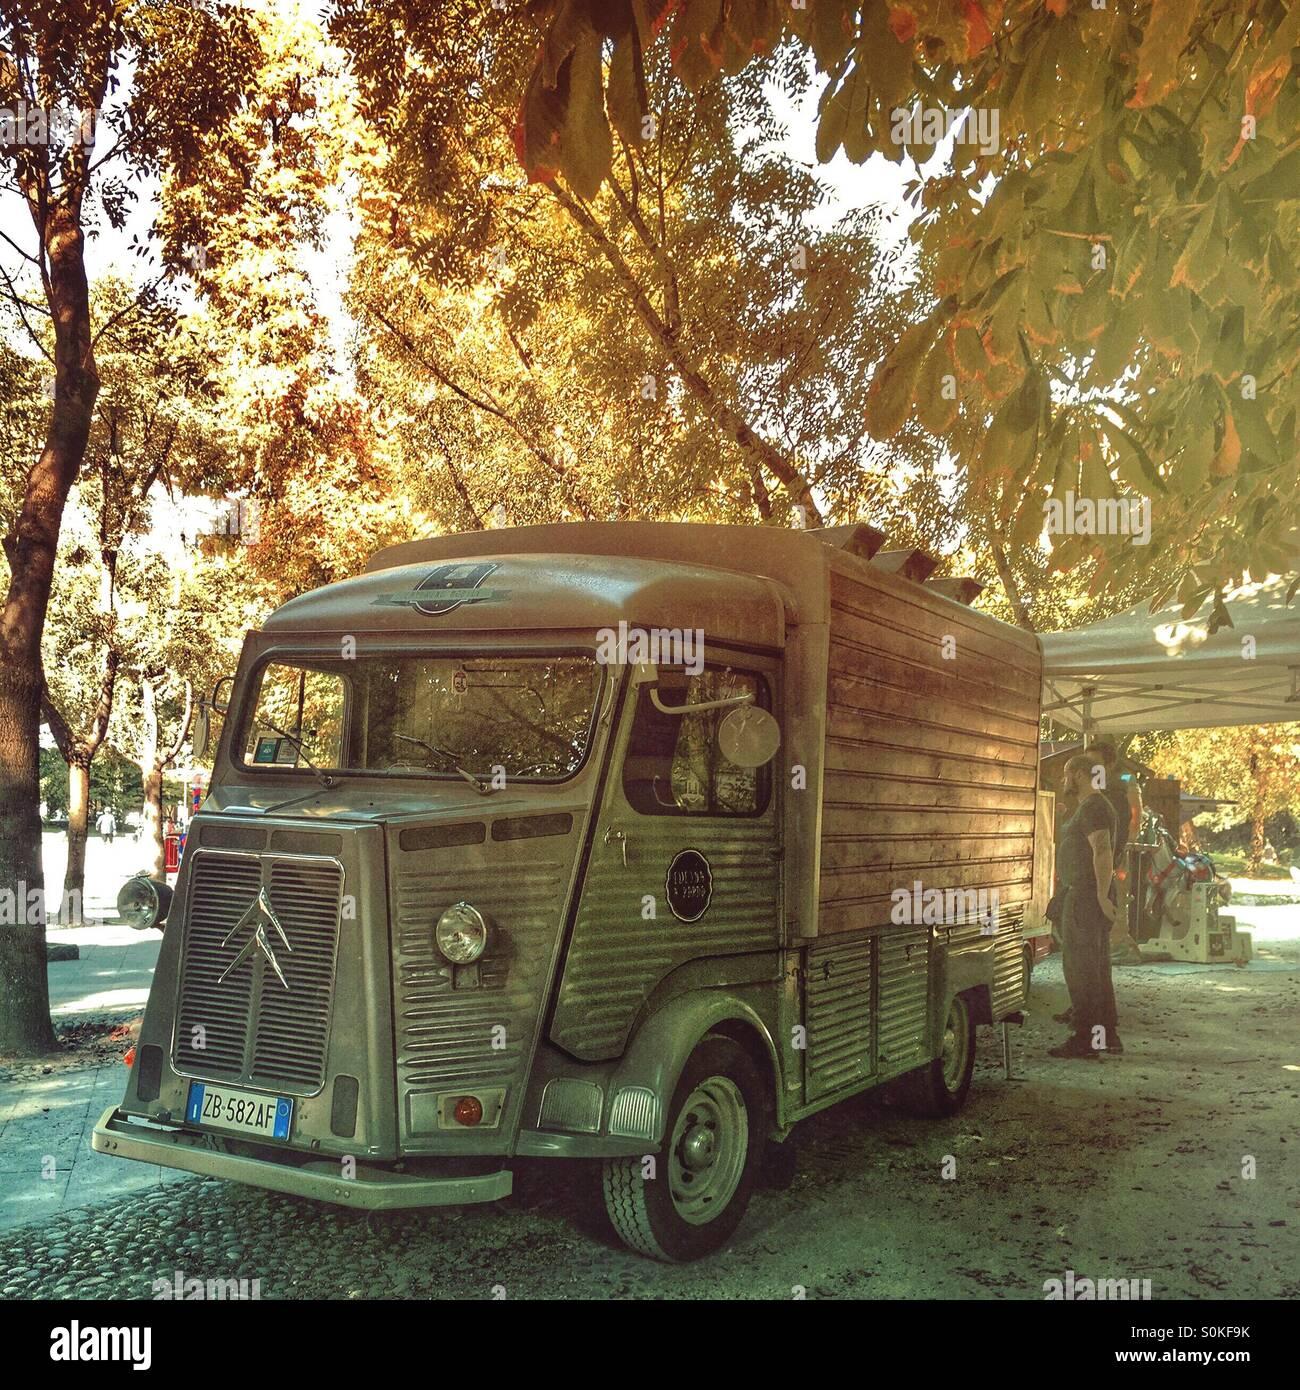 Citroen H street food truck - Stock Image